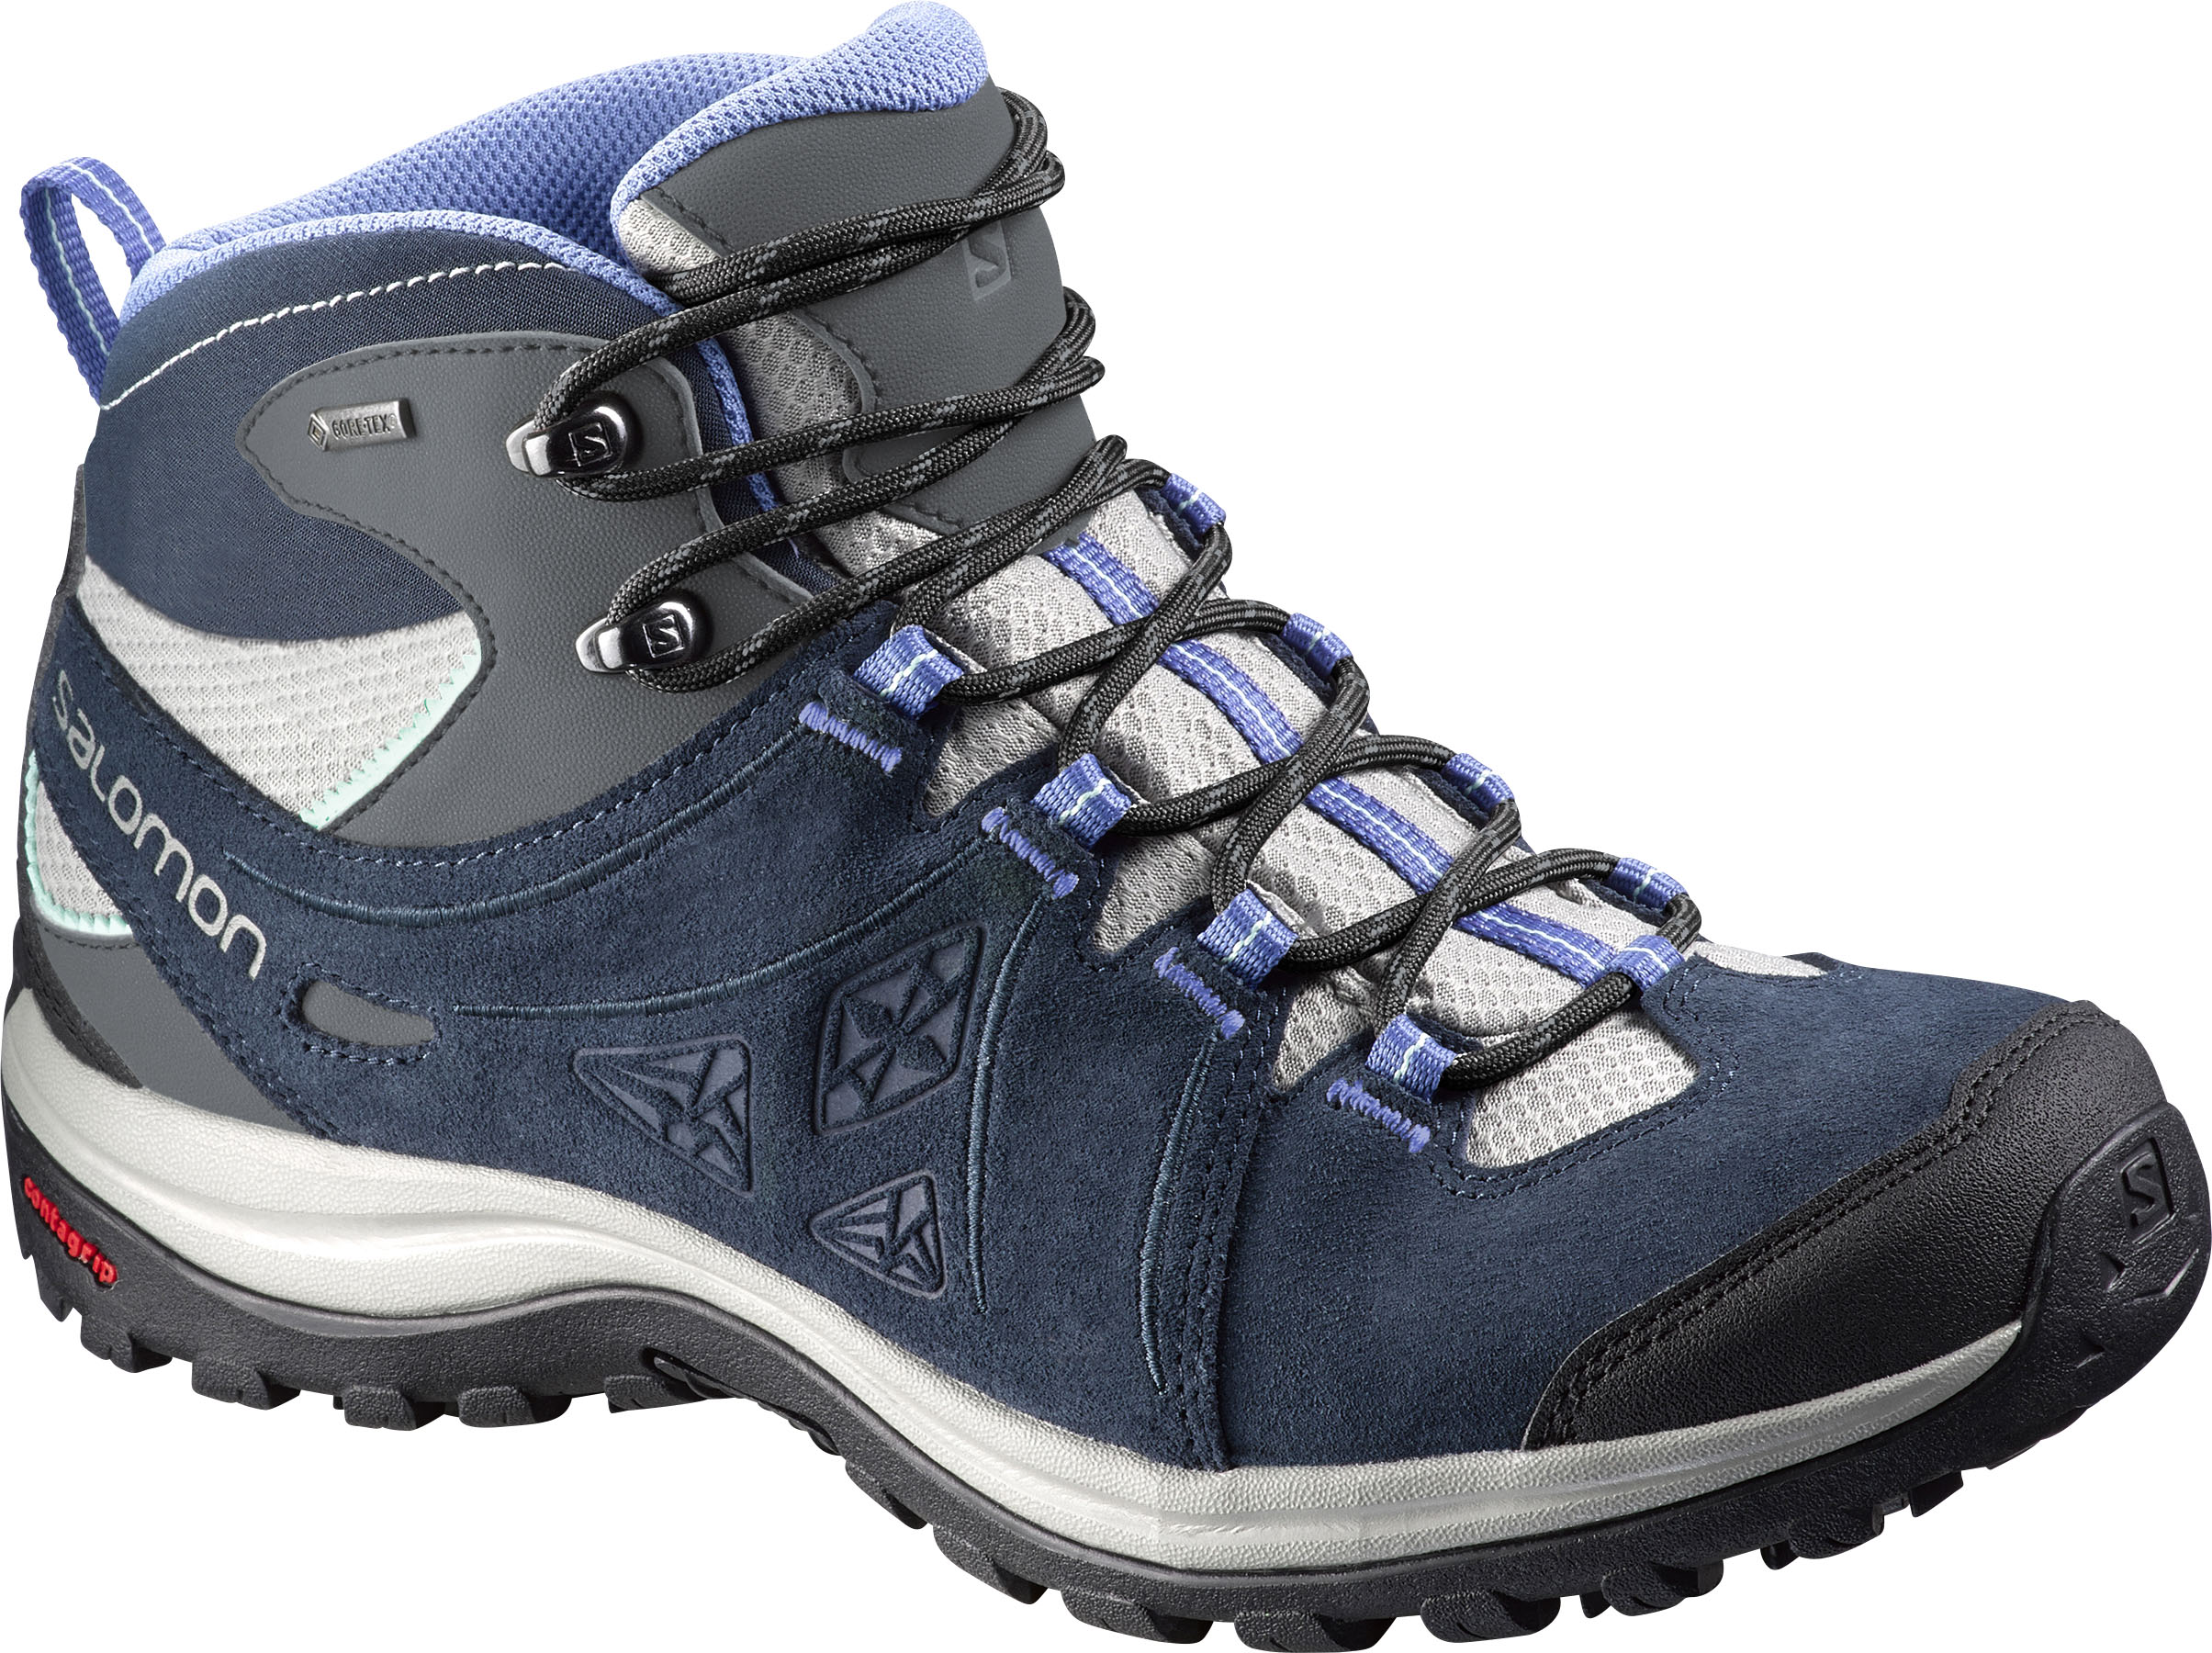 Salomon Ellipse 2 MID LTR GTX W 379179 modrá 42